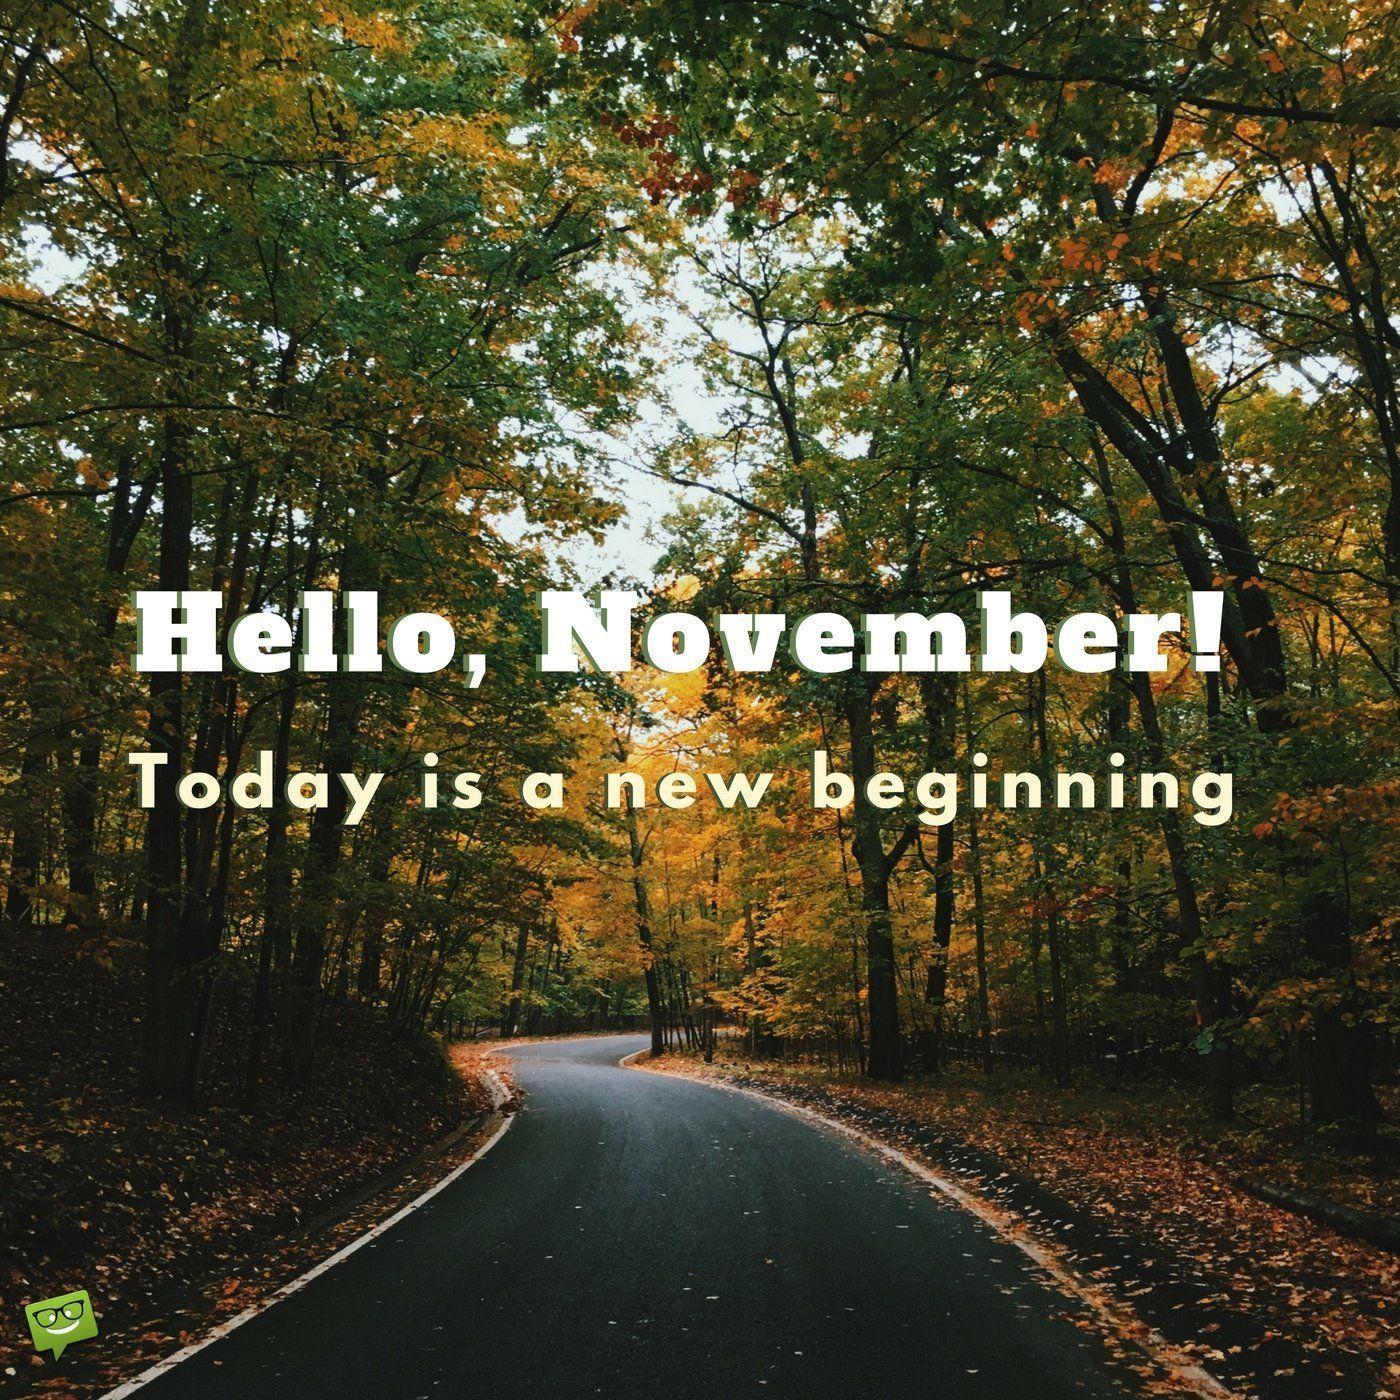 Hello, November! #hellonovemberwallpaper Hello, November. Today is a new beginning! #hellonovemberwallpaper Hello, November! #hellonovemberwallpaper Hello, November. Today is a new beginning! #hellonovemberwallpaper